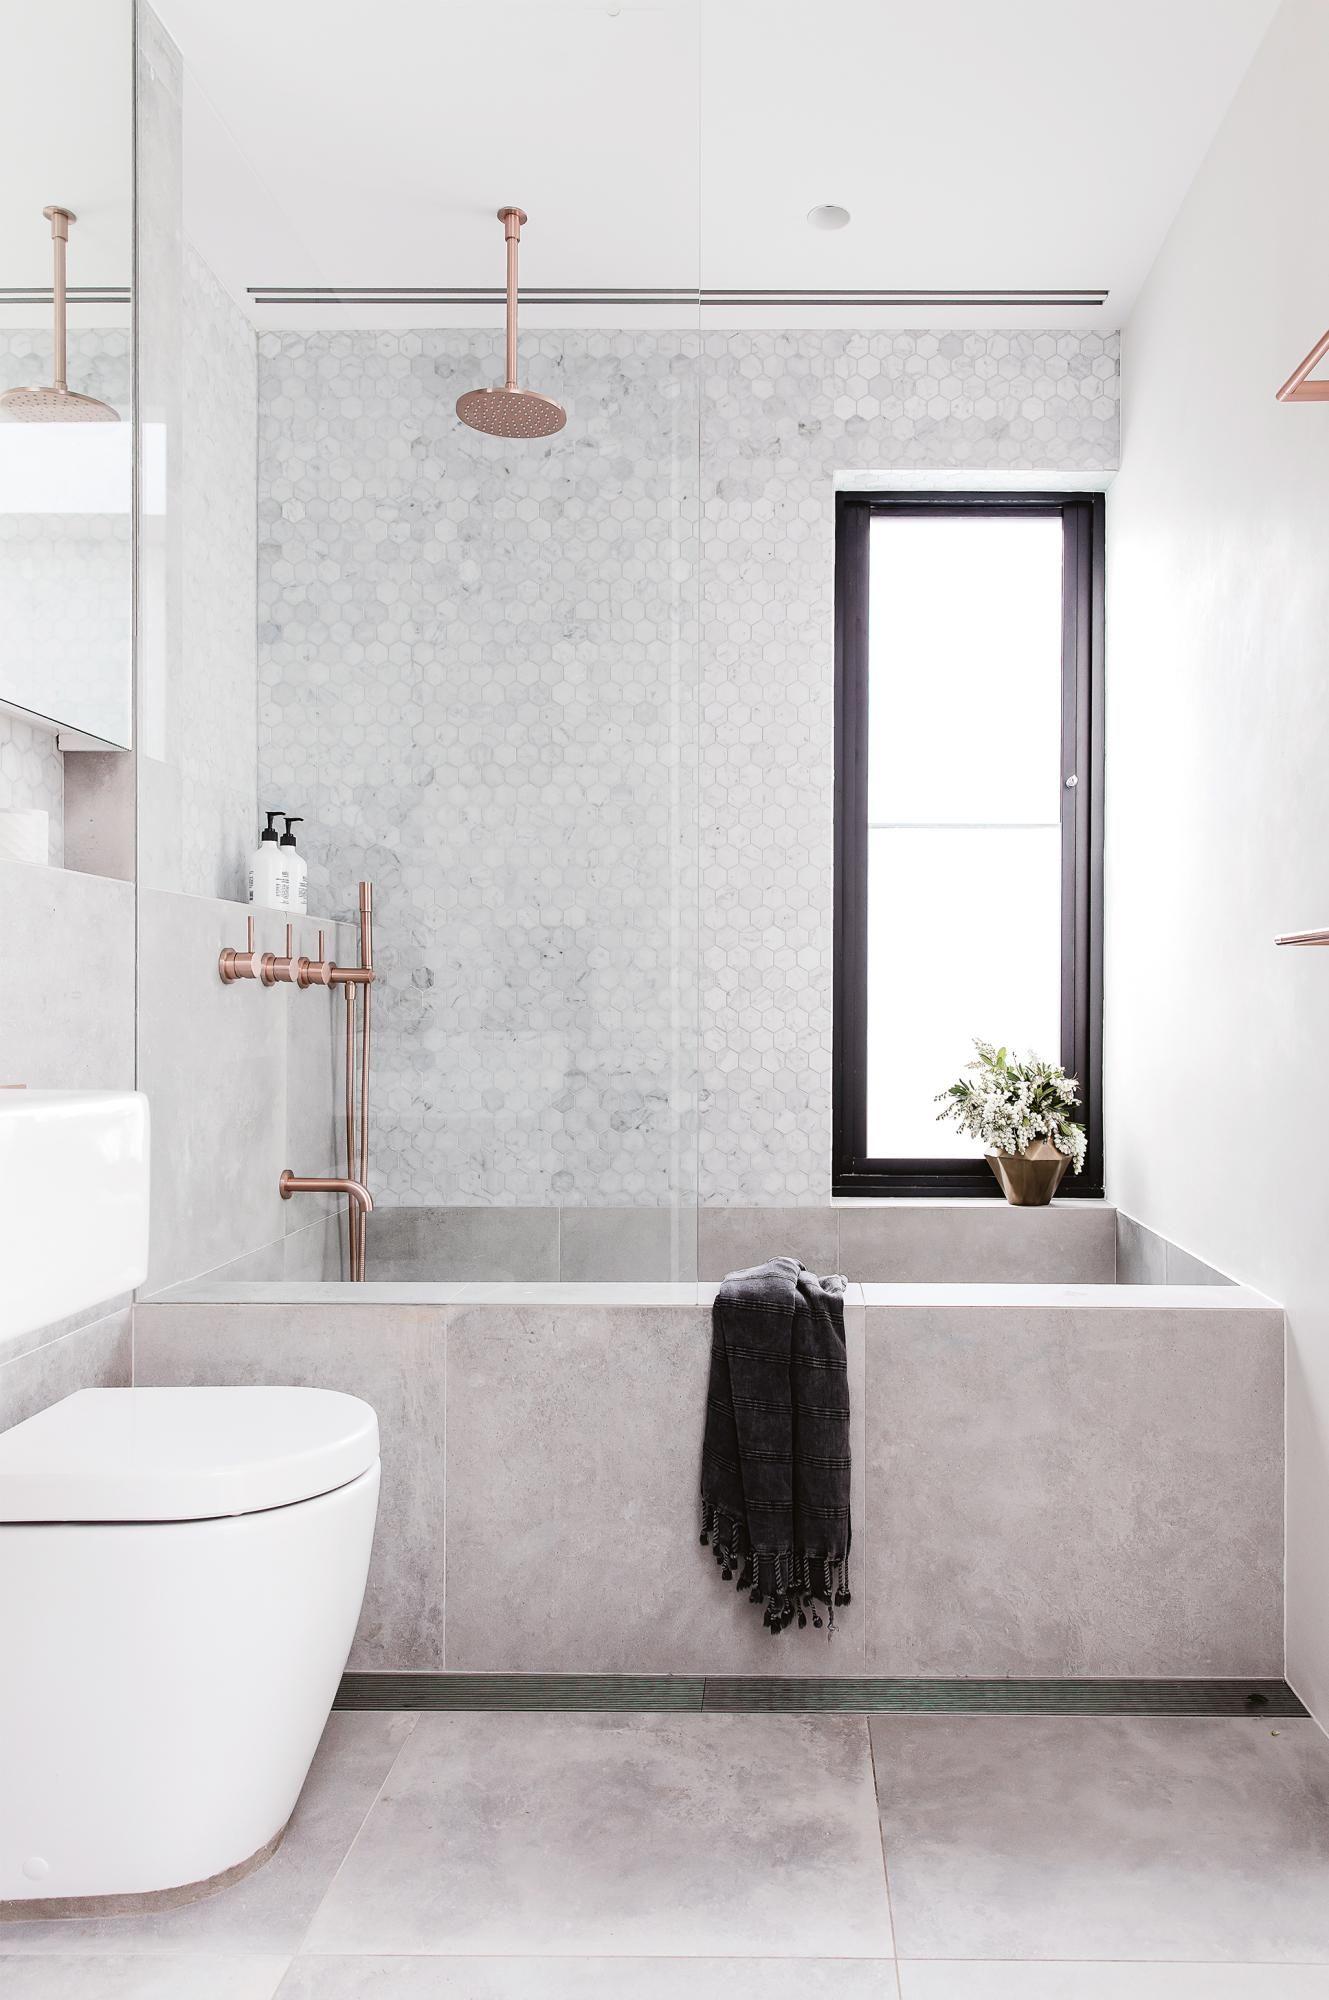 KB-bathroomgallery-24  Bathroom interior, Bathroom design